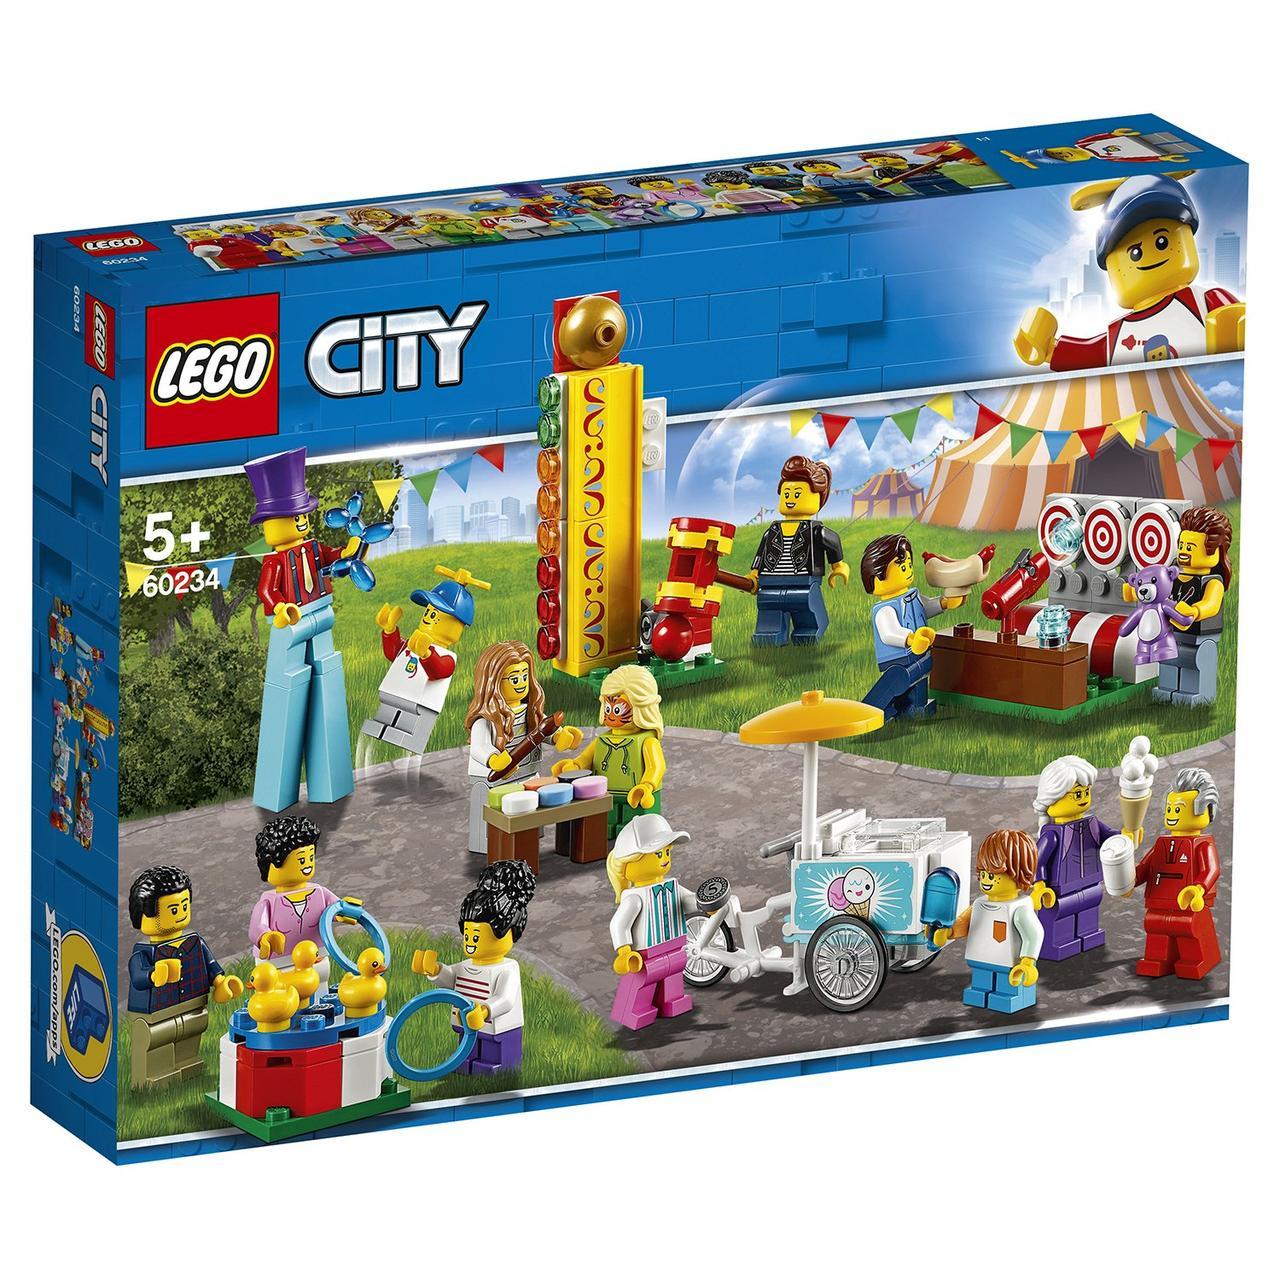 60234 Lego City Комплект минифигурок Весёлая ярмарка, Лего Город Сити